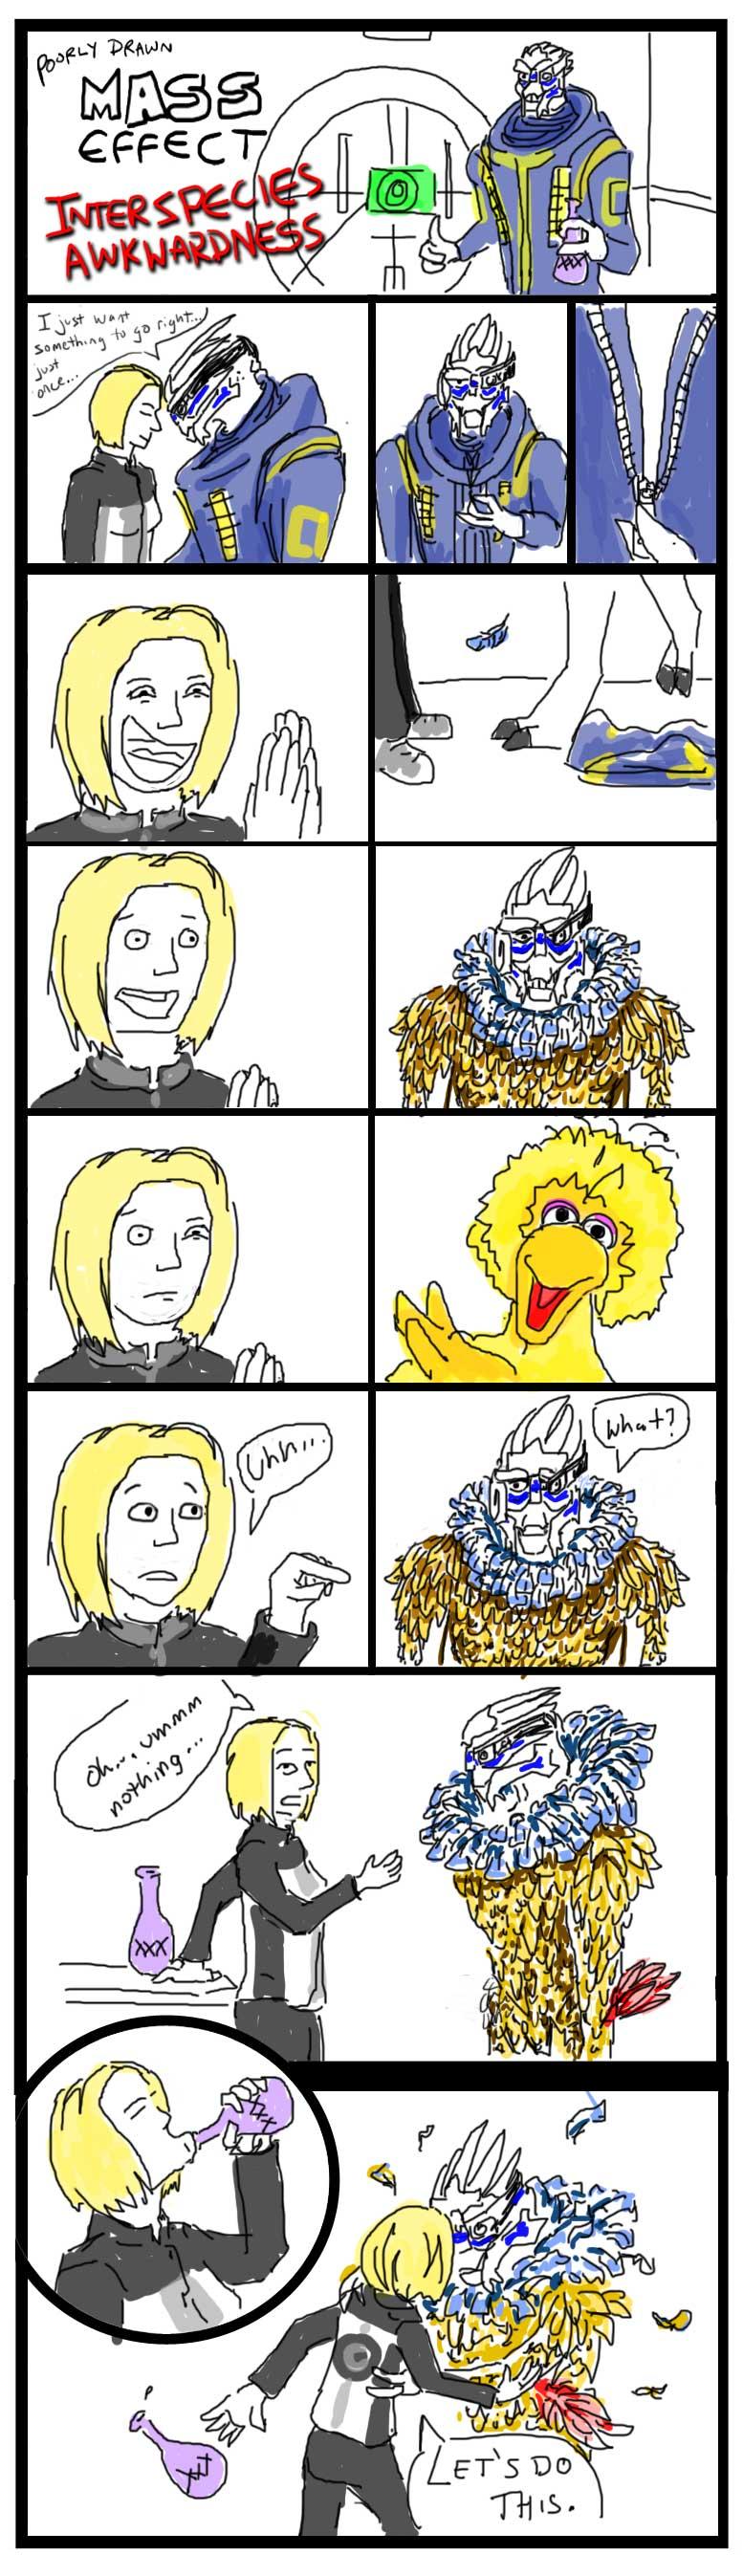 Poorly Drawn ME - Awkwardness by efleck